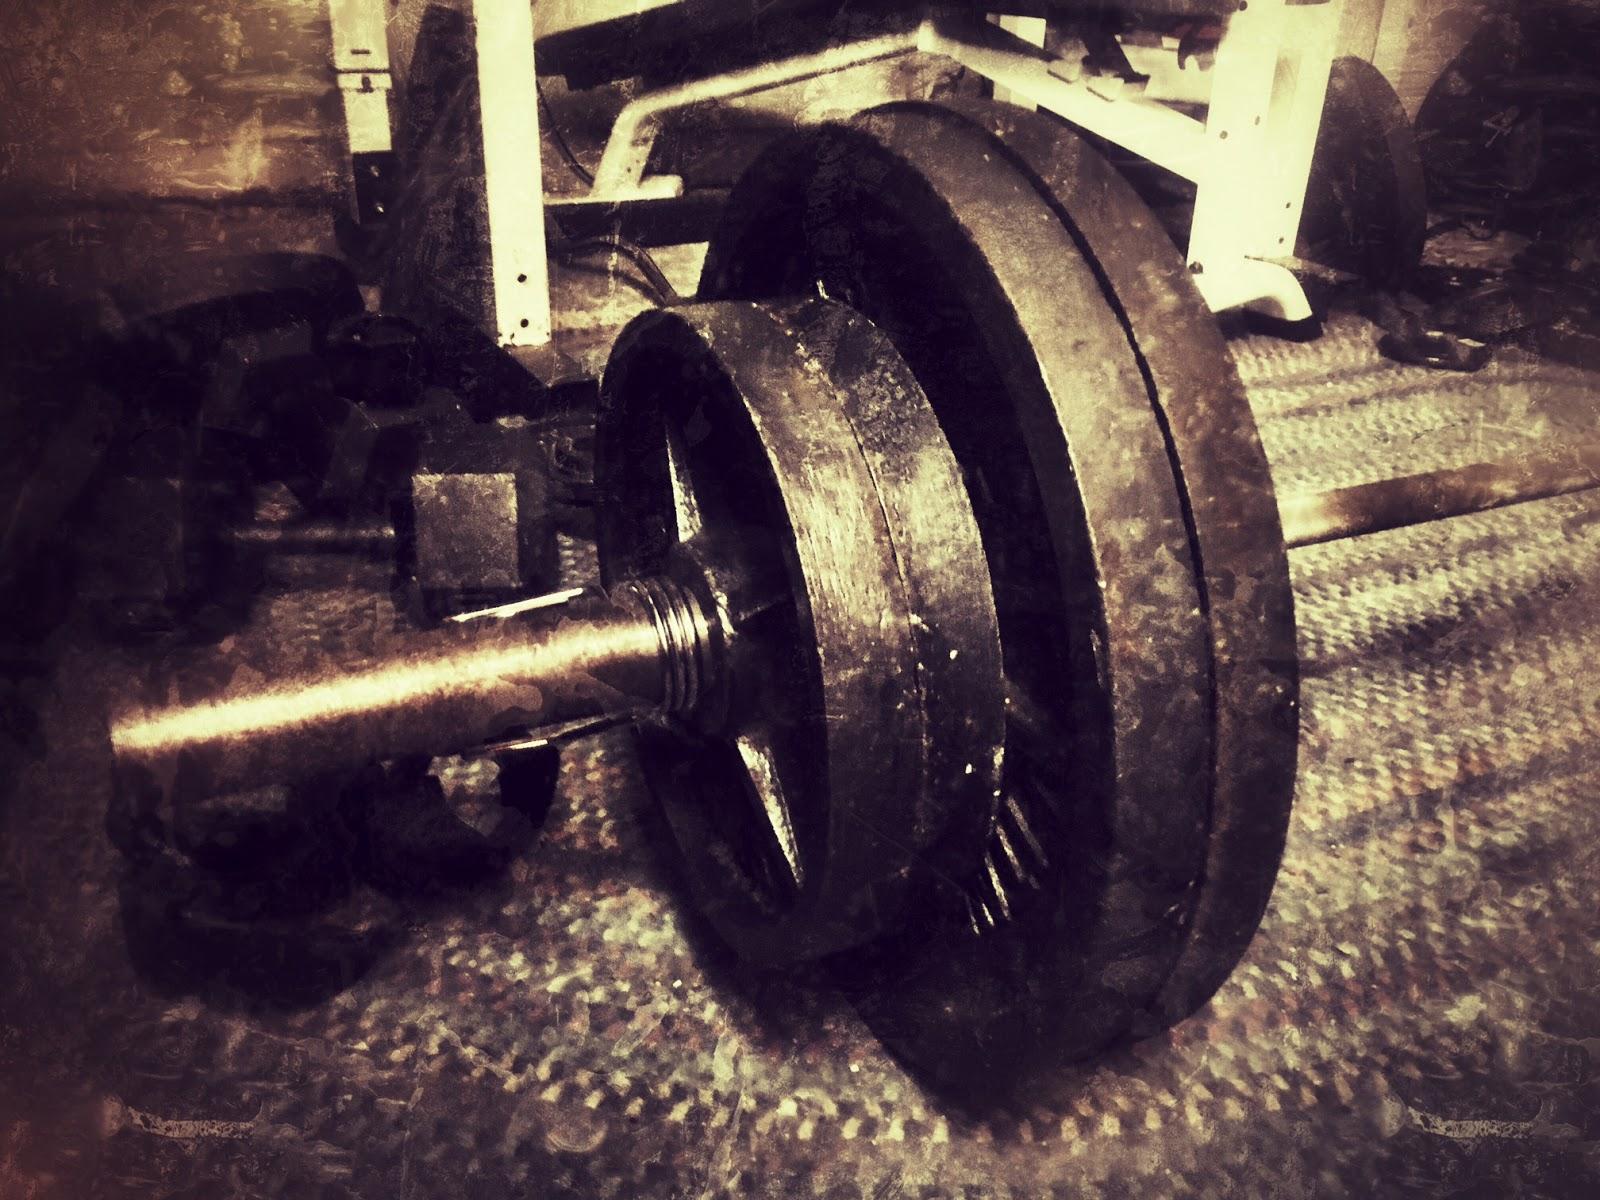 Crushing Pavement: Deadlift Challenge #2